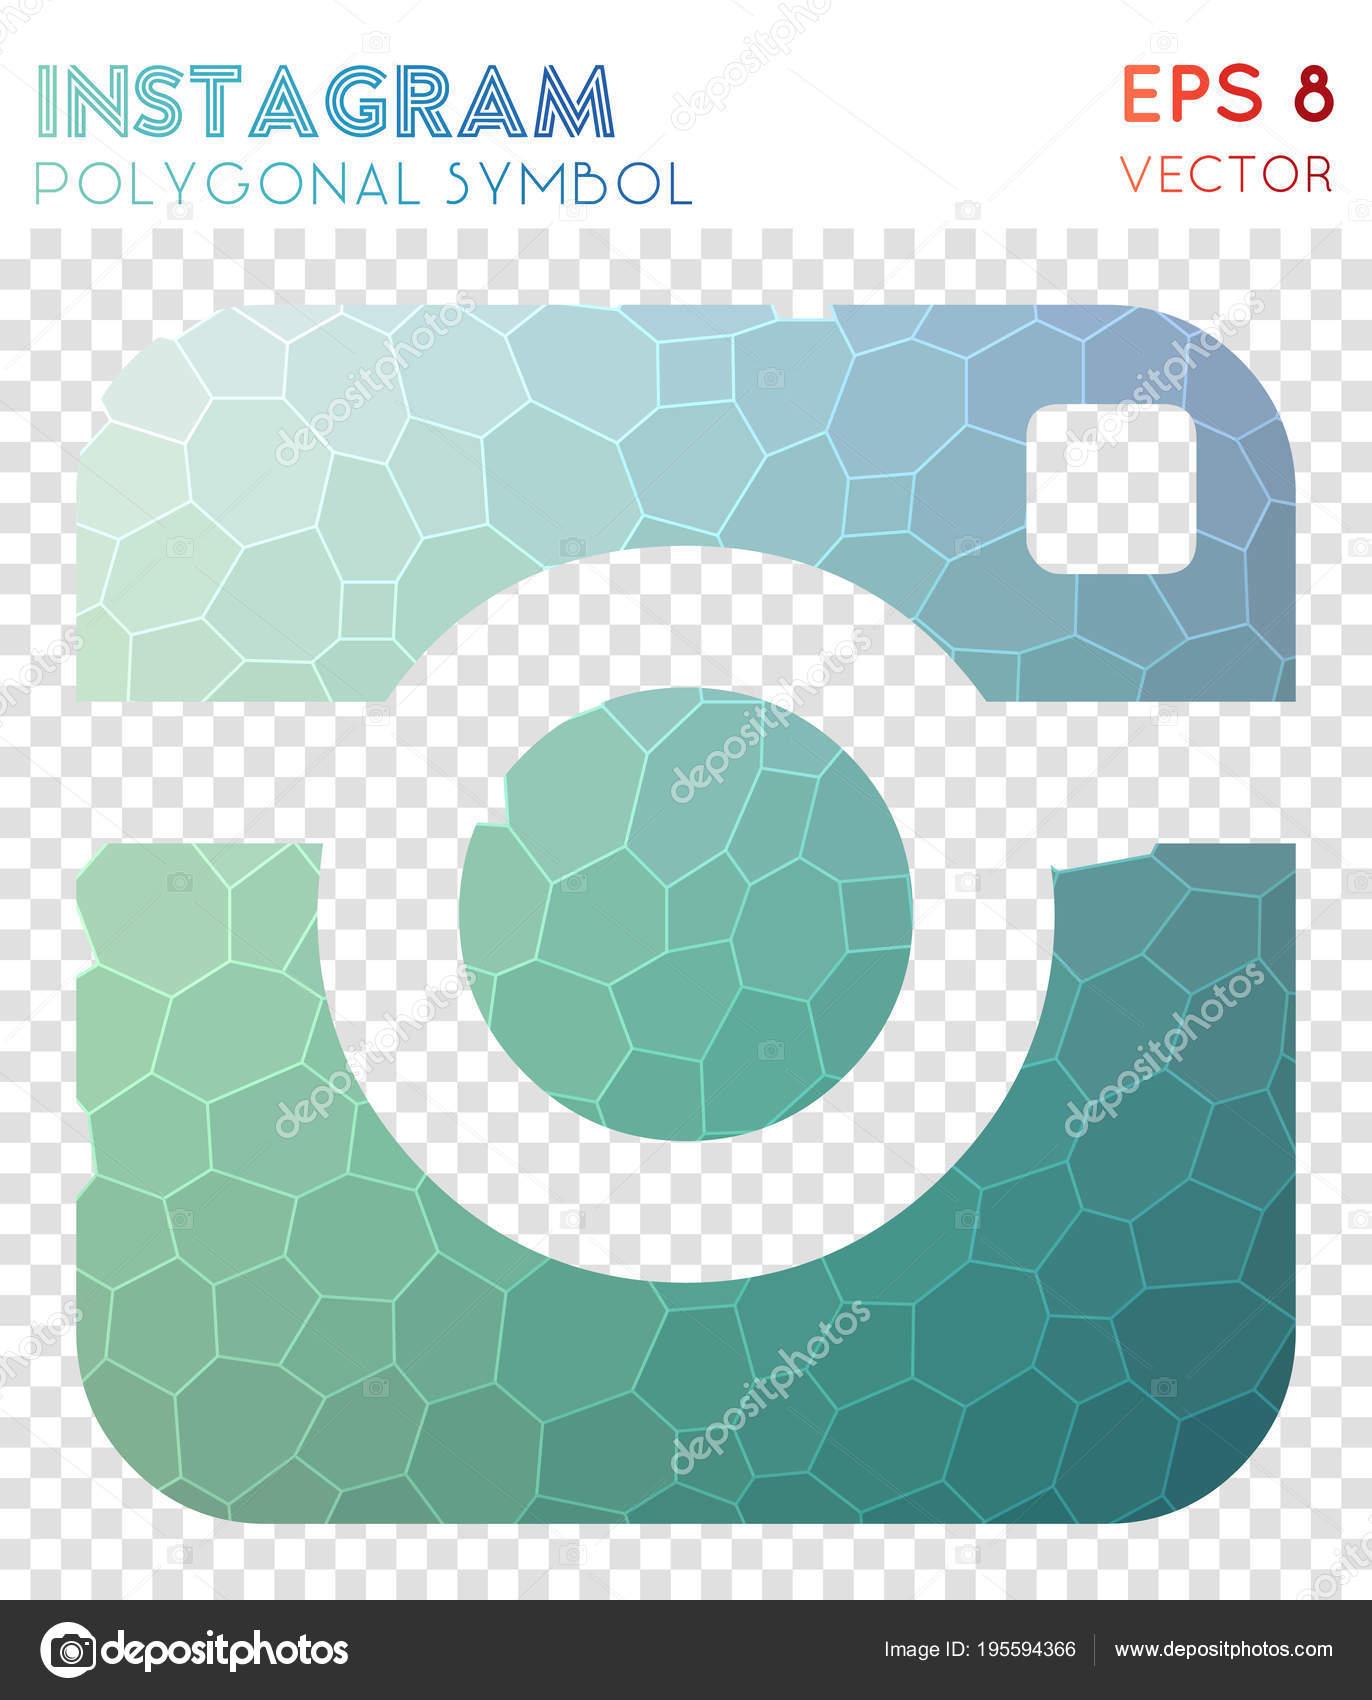 Instagram Polygonal Symbol Appealing Mosaic Style Symbol Uncommon